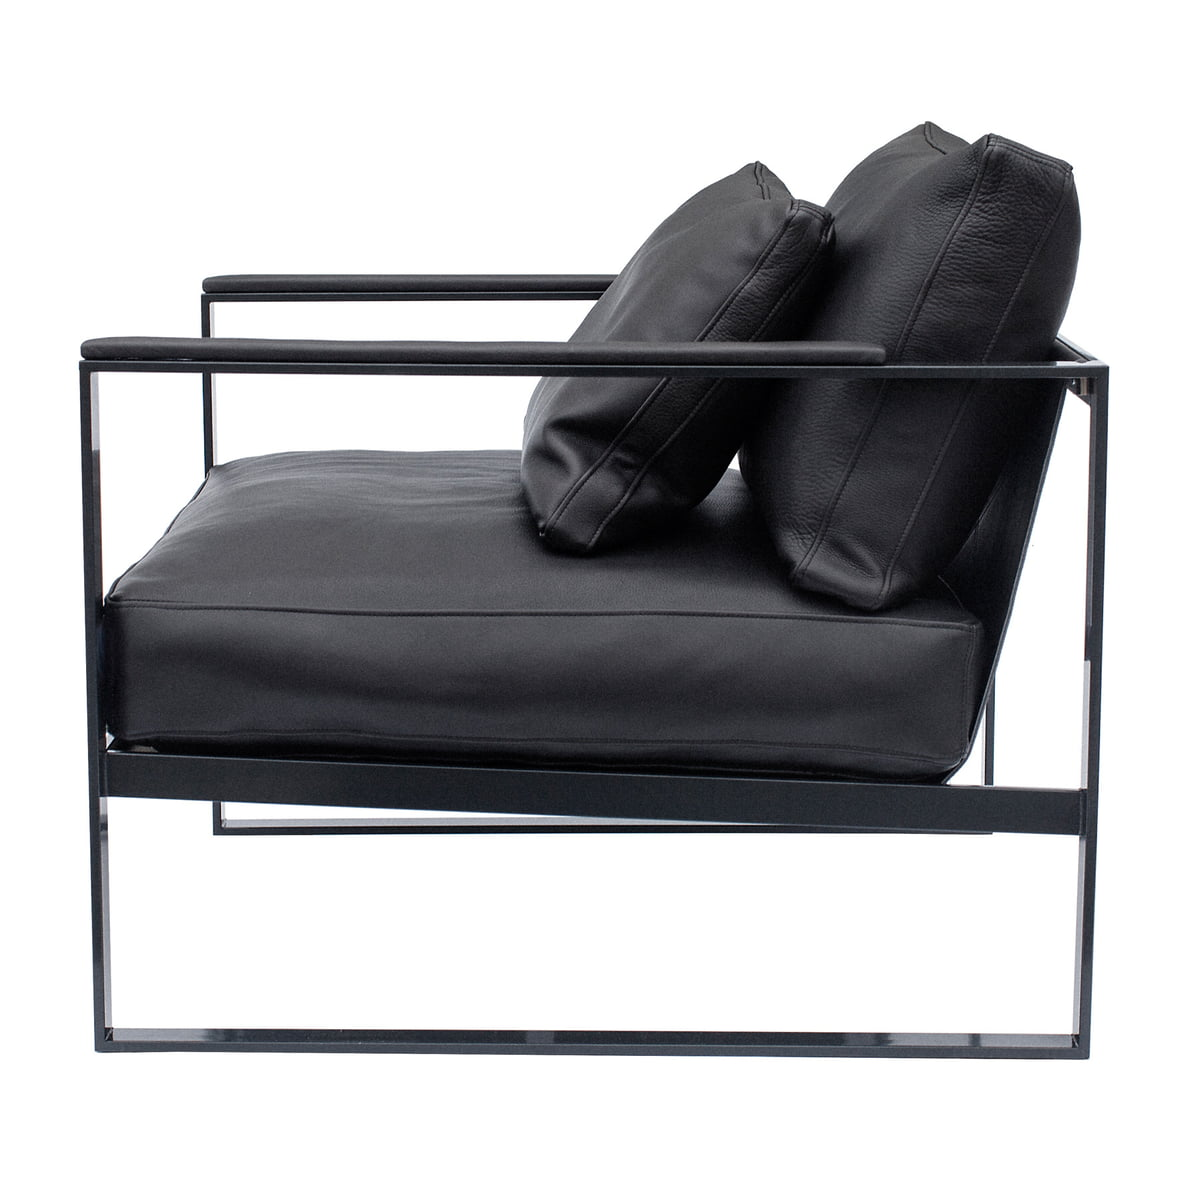 r shults monaco lounge chair schwarz leder. Black Bedroom Furniture Sets. Home Design Ideas